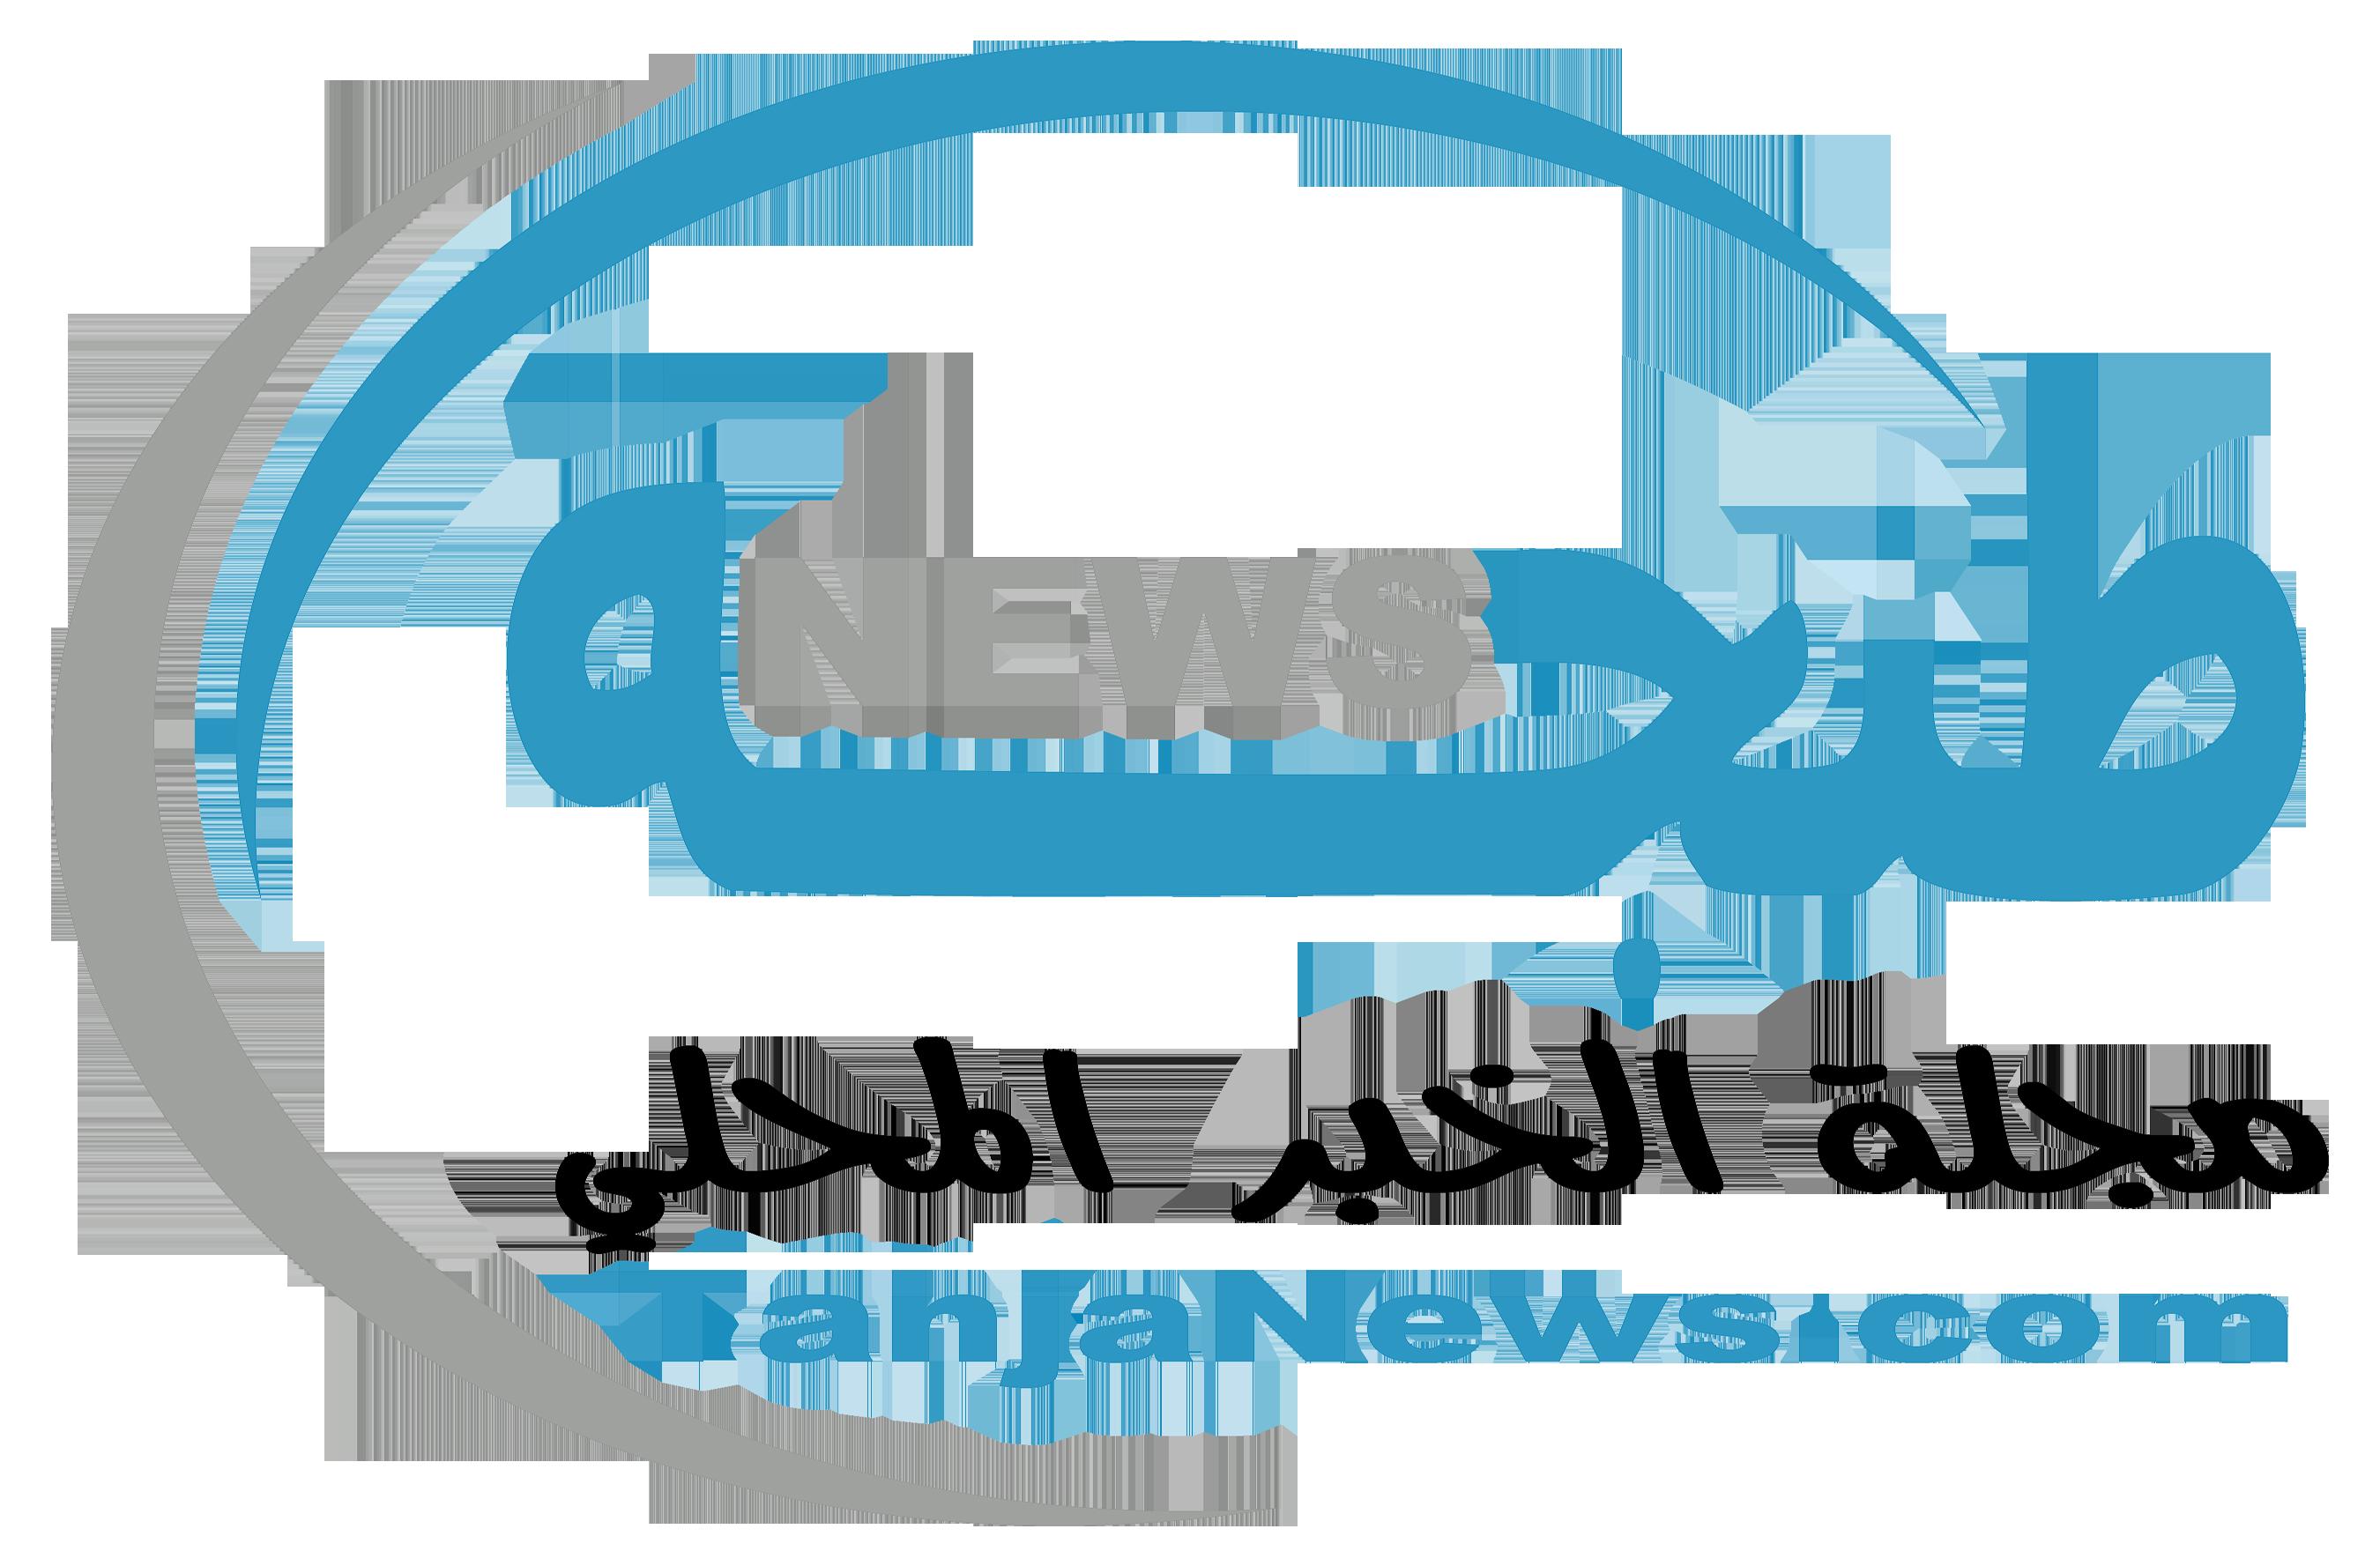 Tanjanews